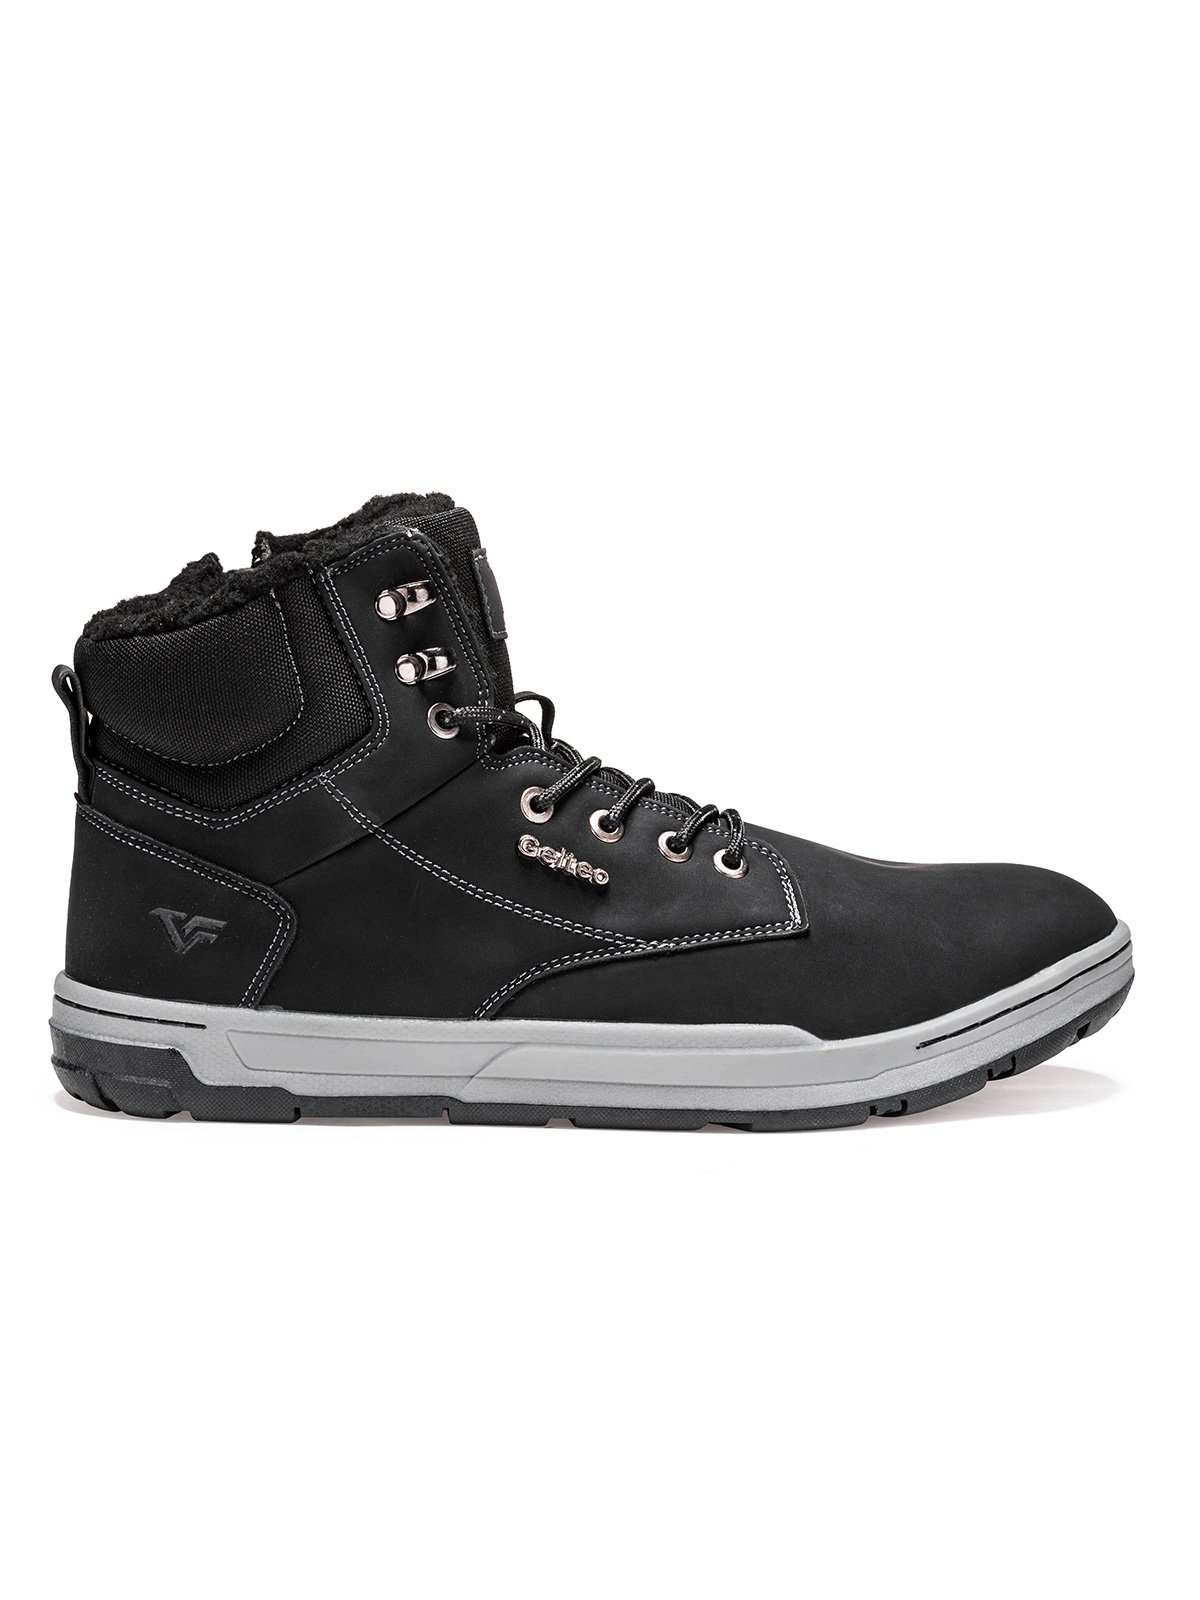 Buty męskie zimowe trapery 255T czarne